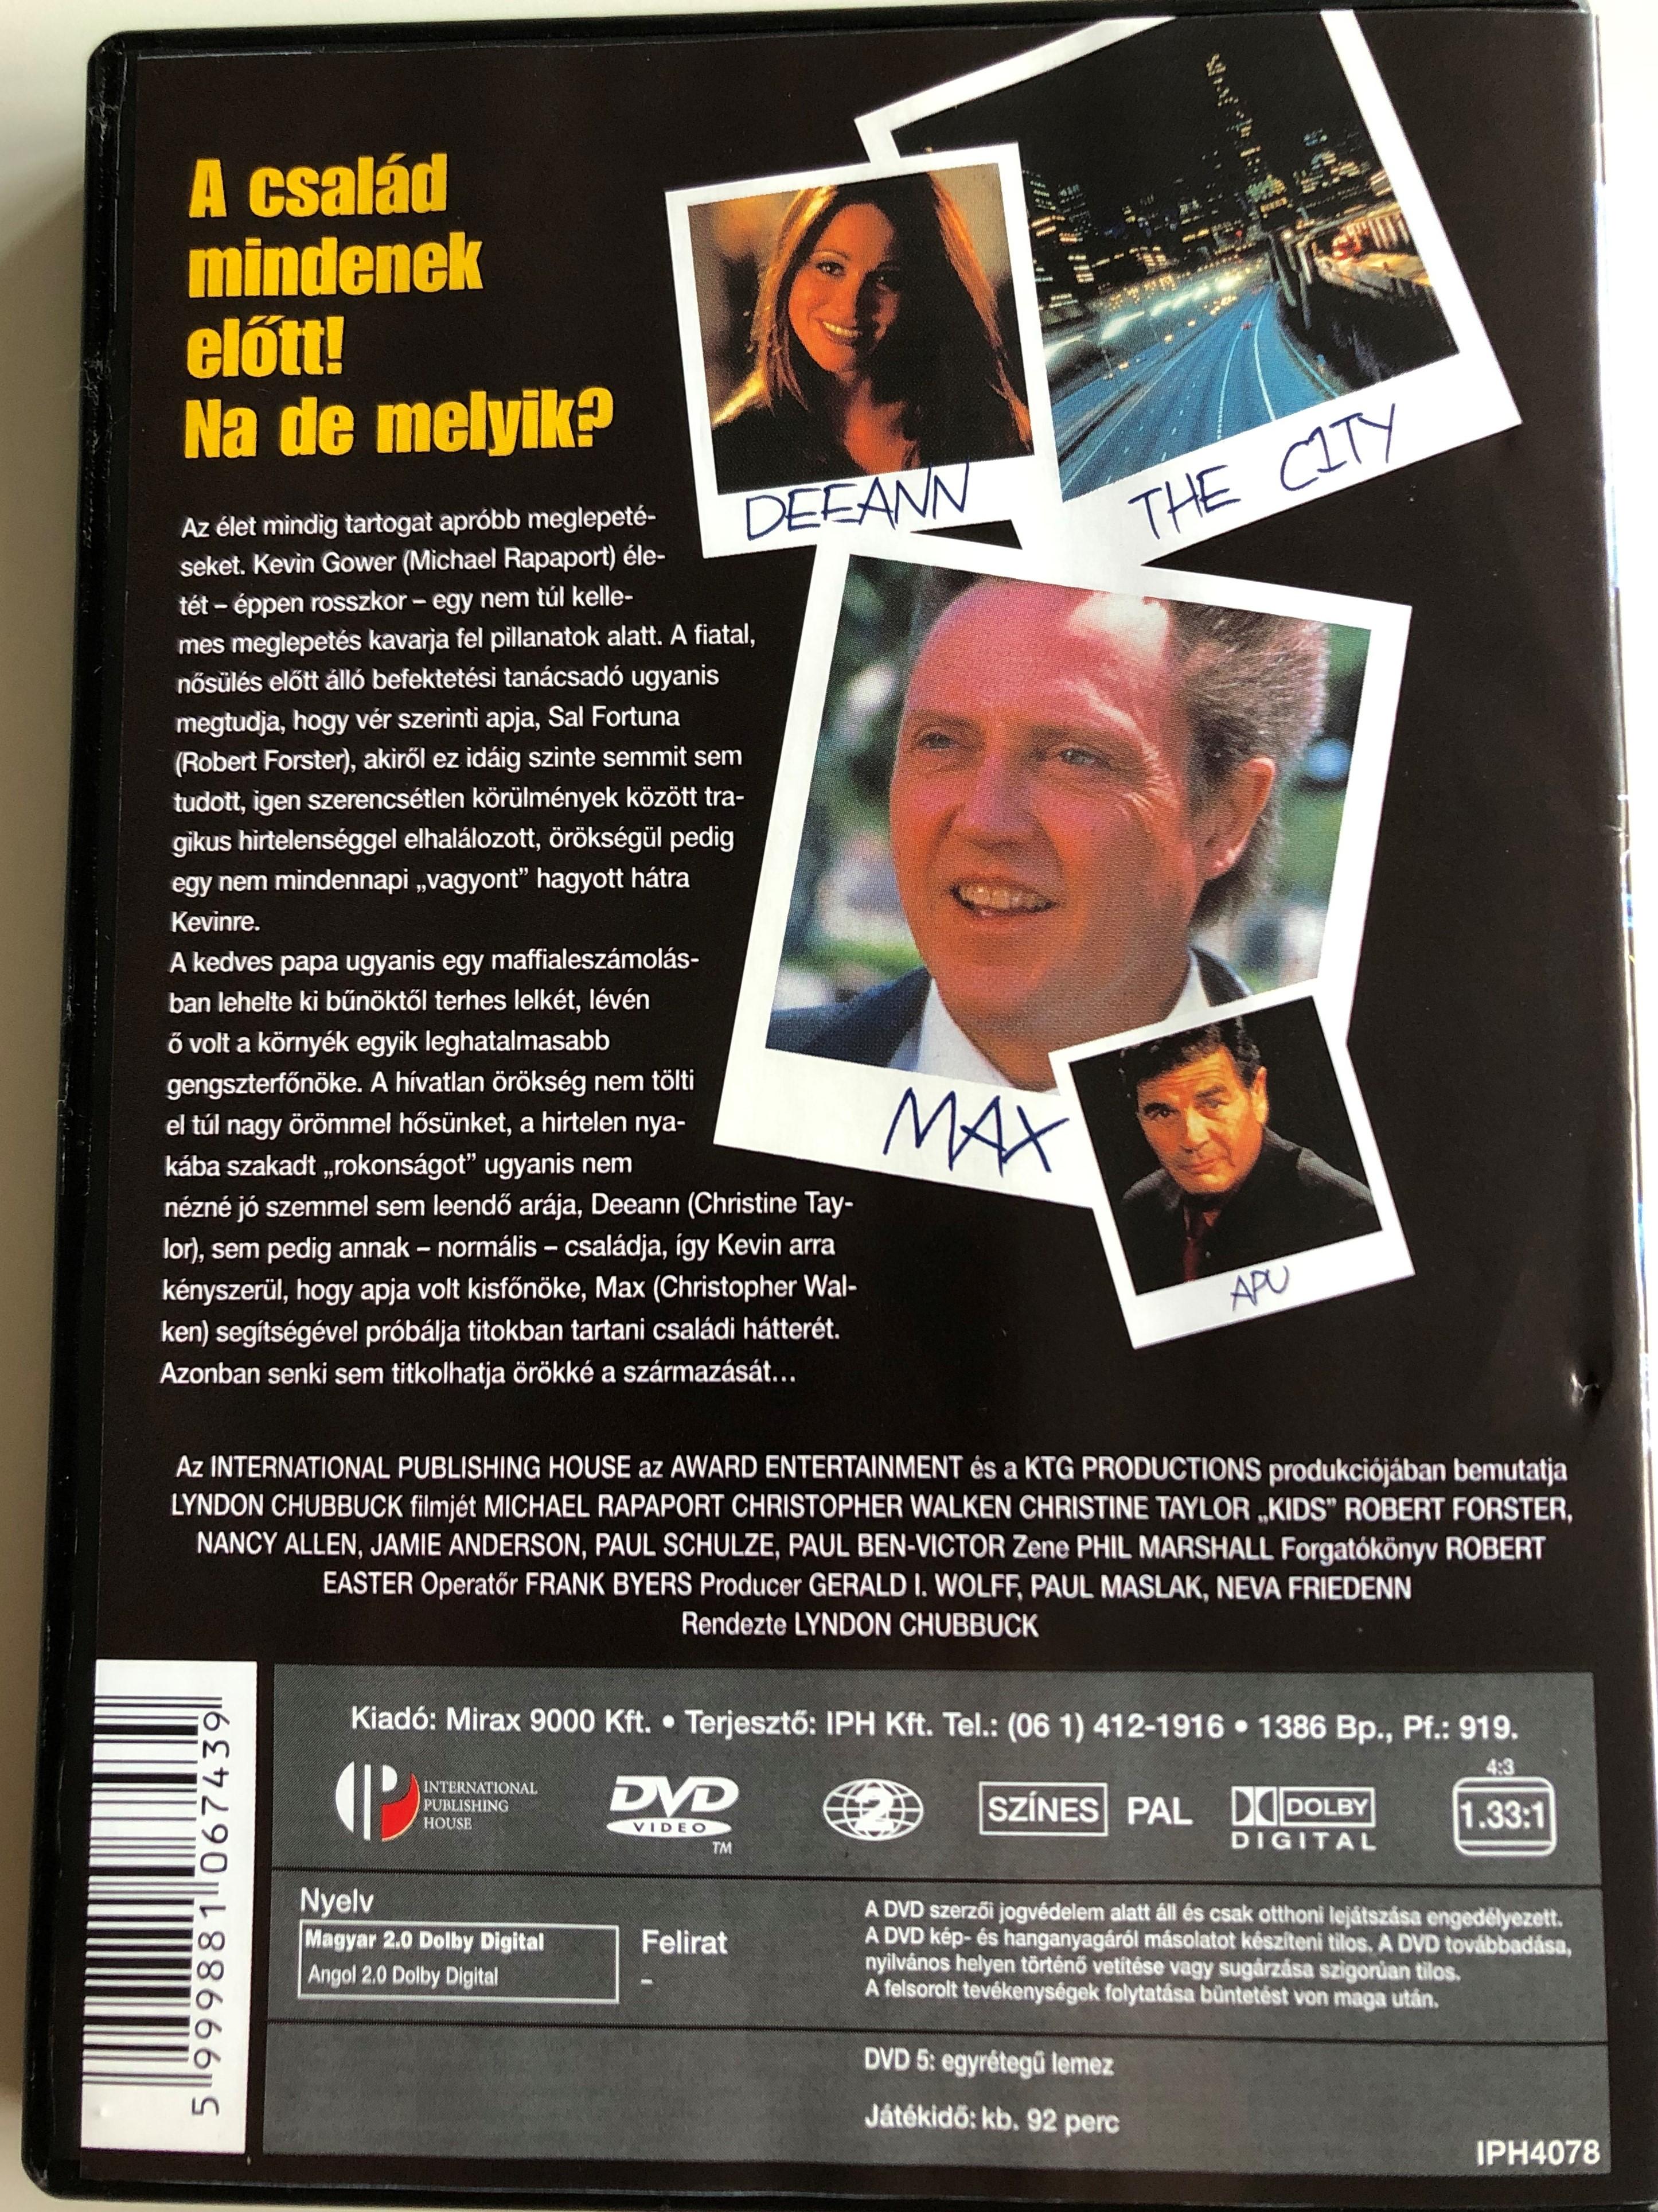 kiss-toledo-goodbye-dvd-1999-viszl-t-gengszter-directed-by-lyndon-chubbuck-starring-michael-rapaport-christopher-walken-christine-taylor-robert-forster-nancy-allen-2-.jpg